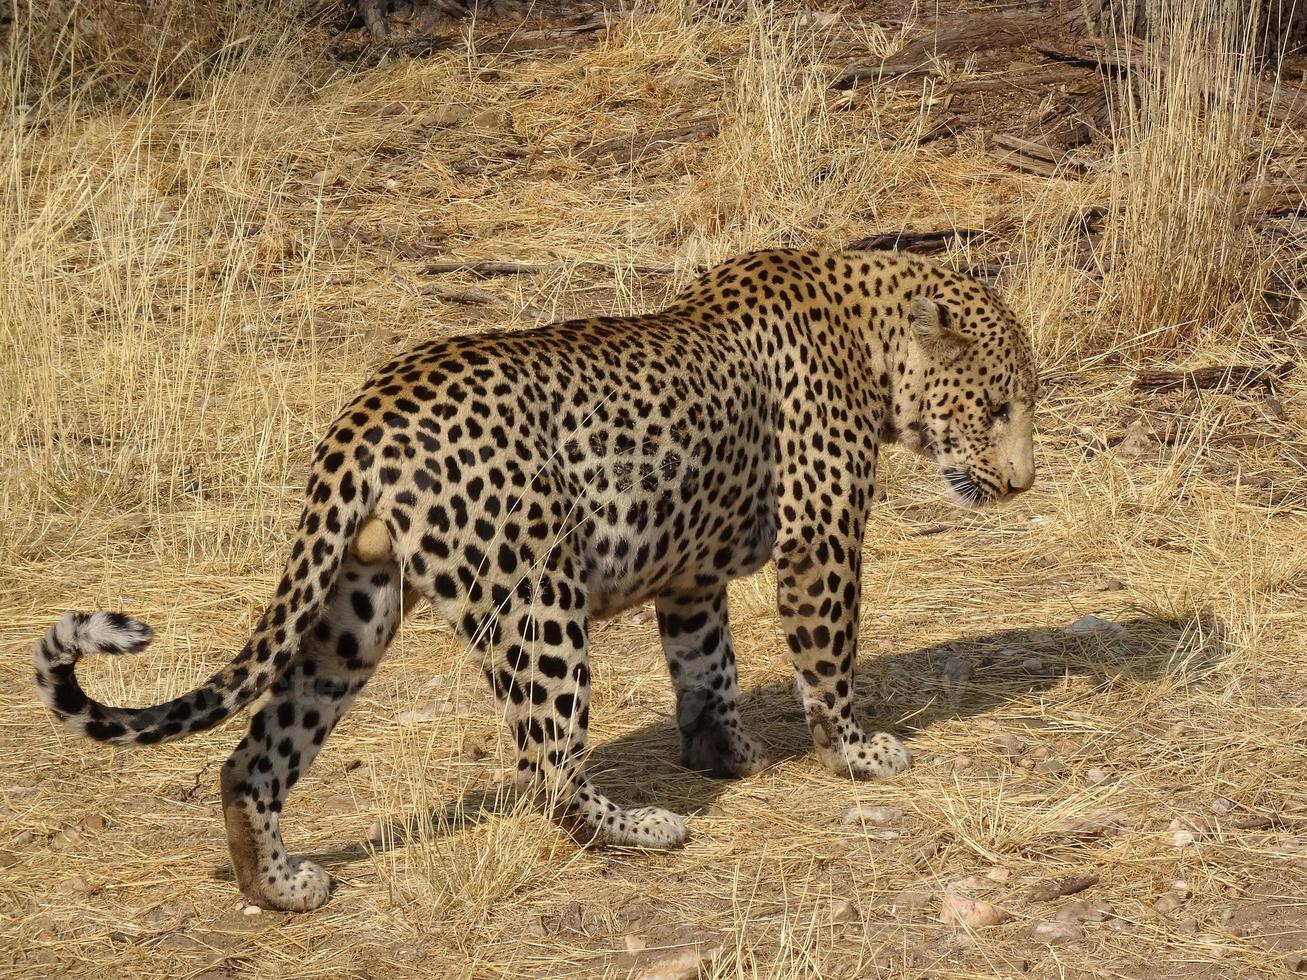 prachtige luipaard wandelen foto